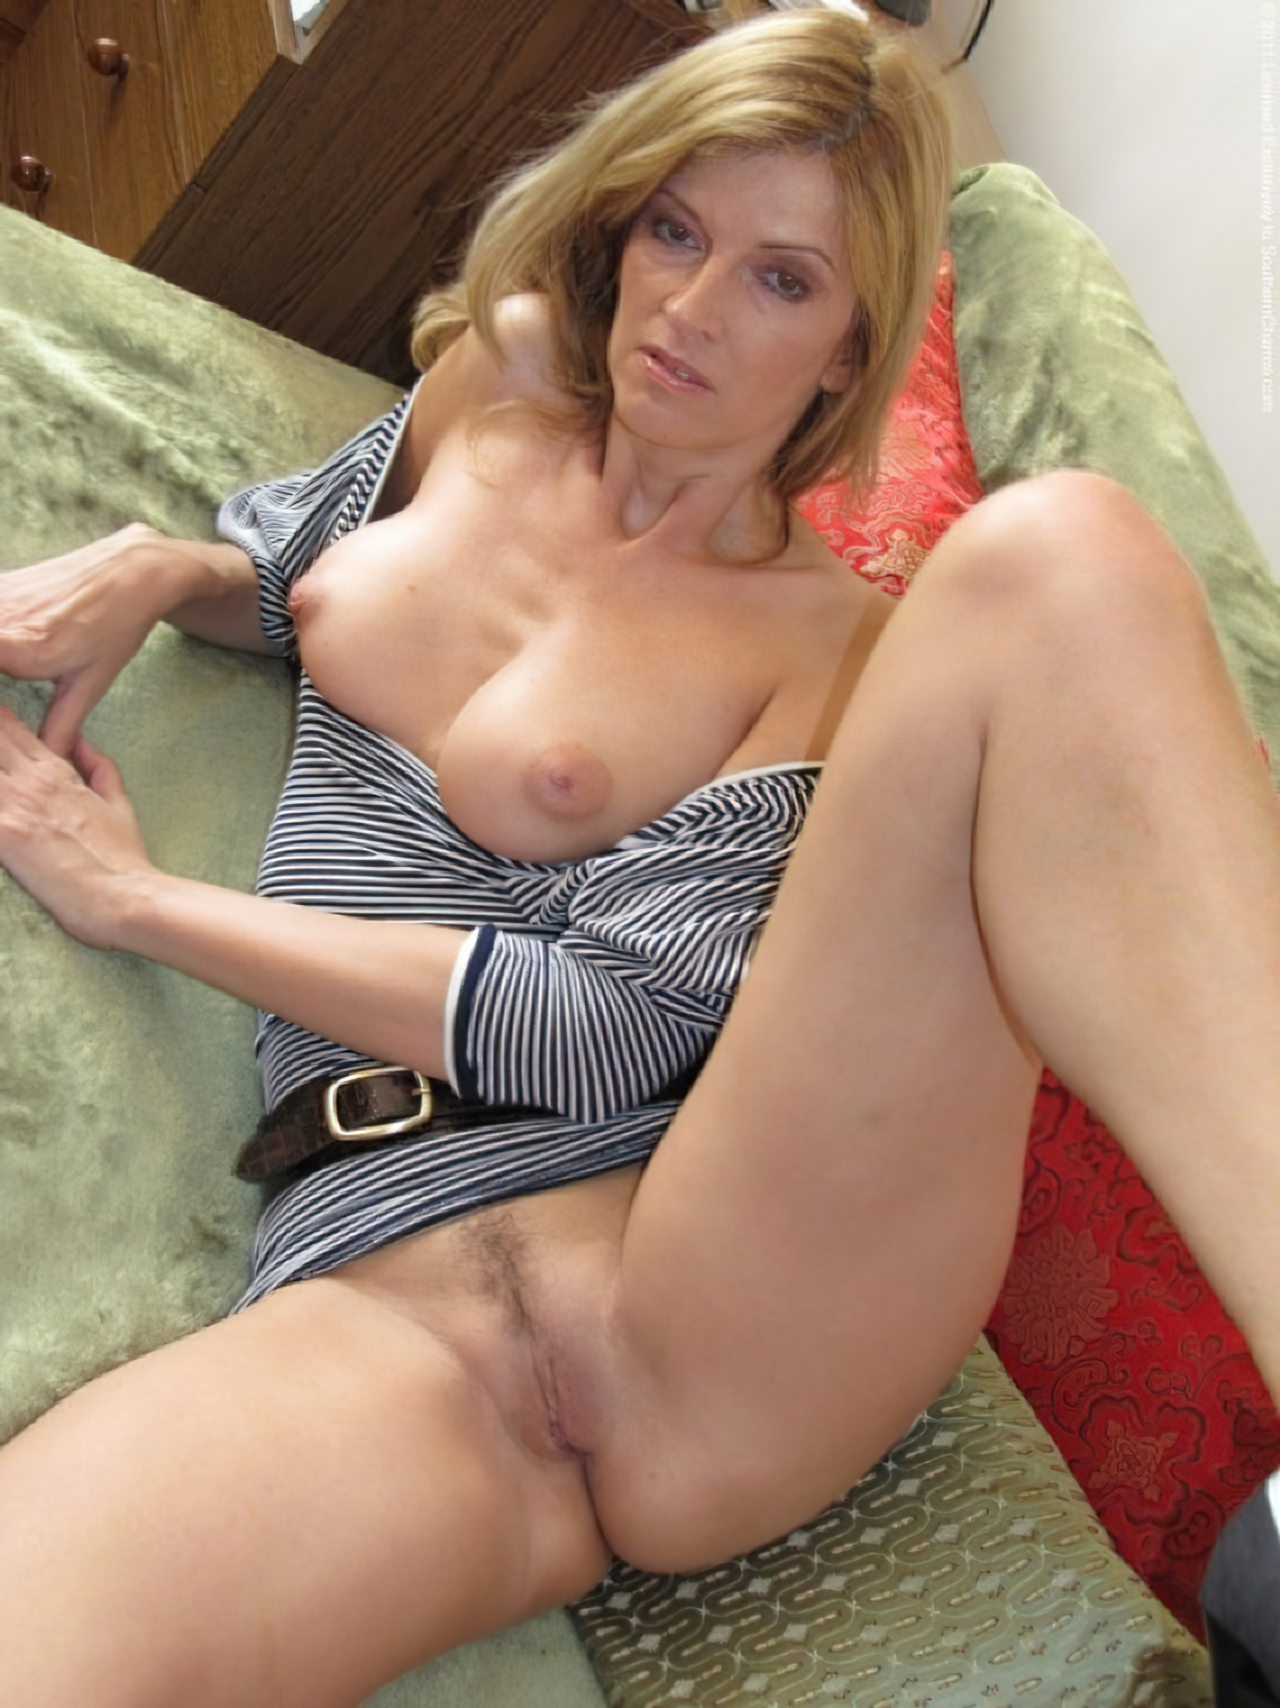 undress the naked girl